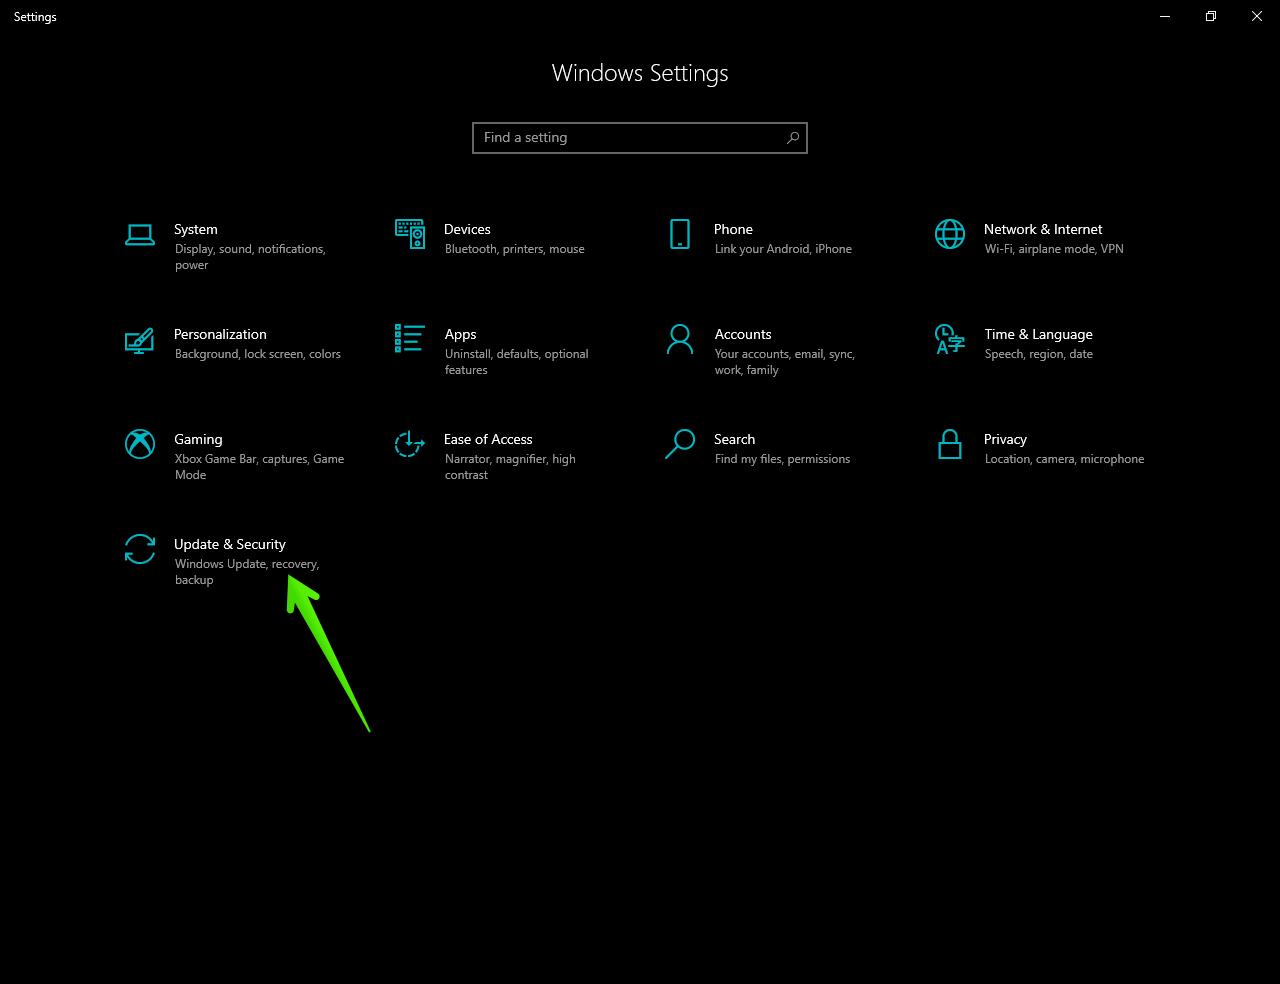 Windows update & Security in settings